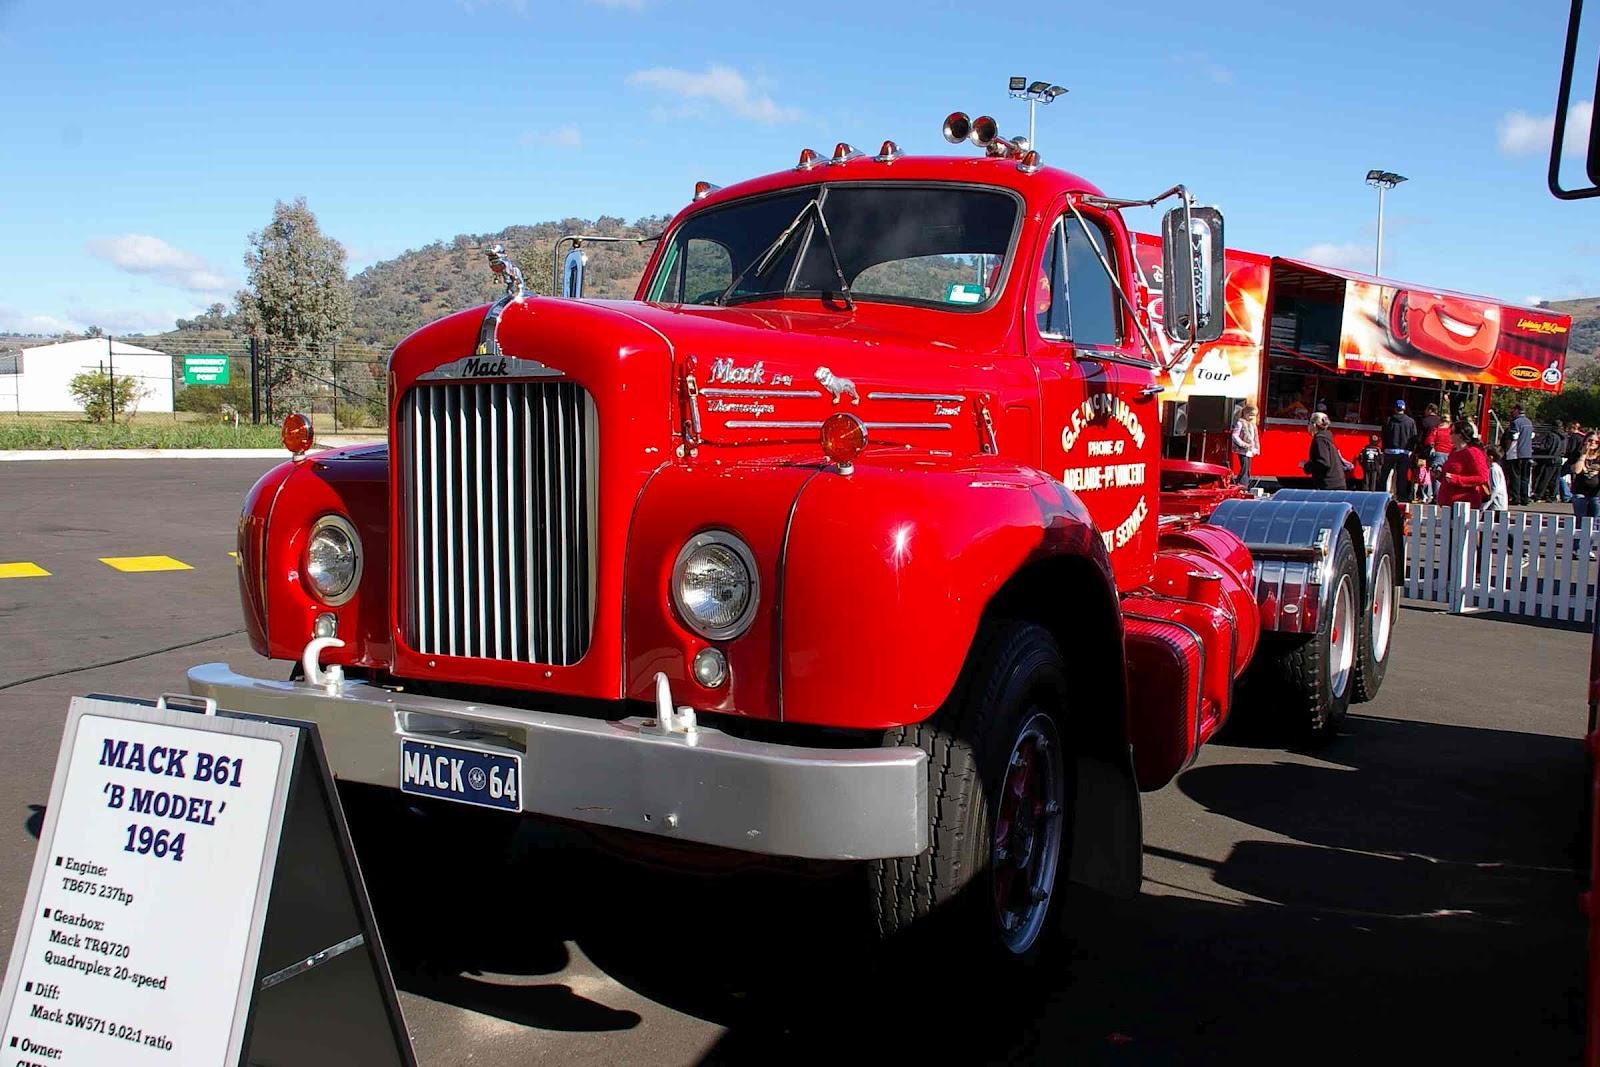 1964 Mack B Model : Historic trucks opening of cmv albury wodonga may